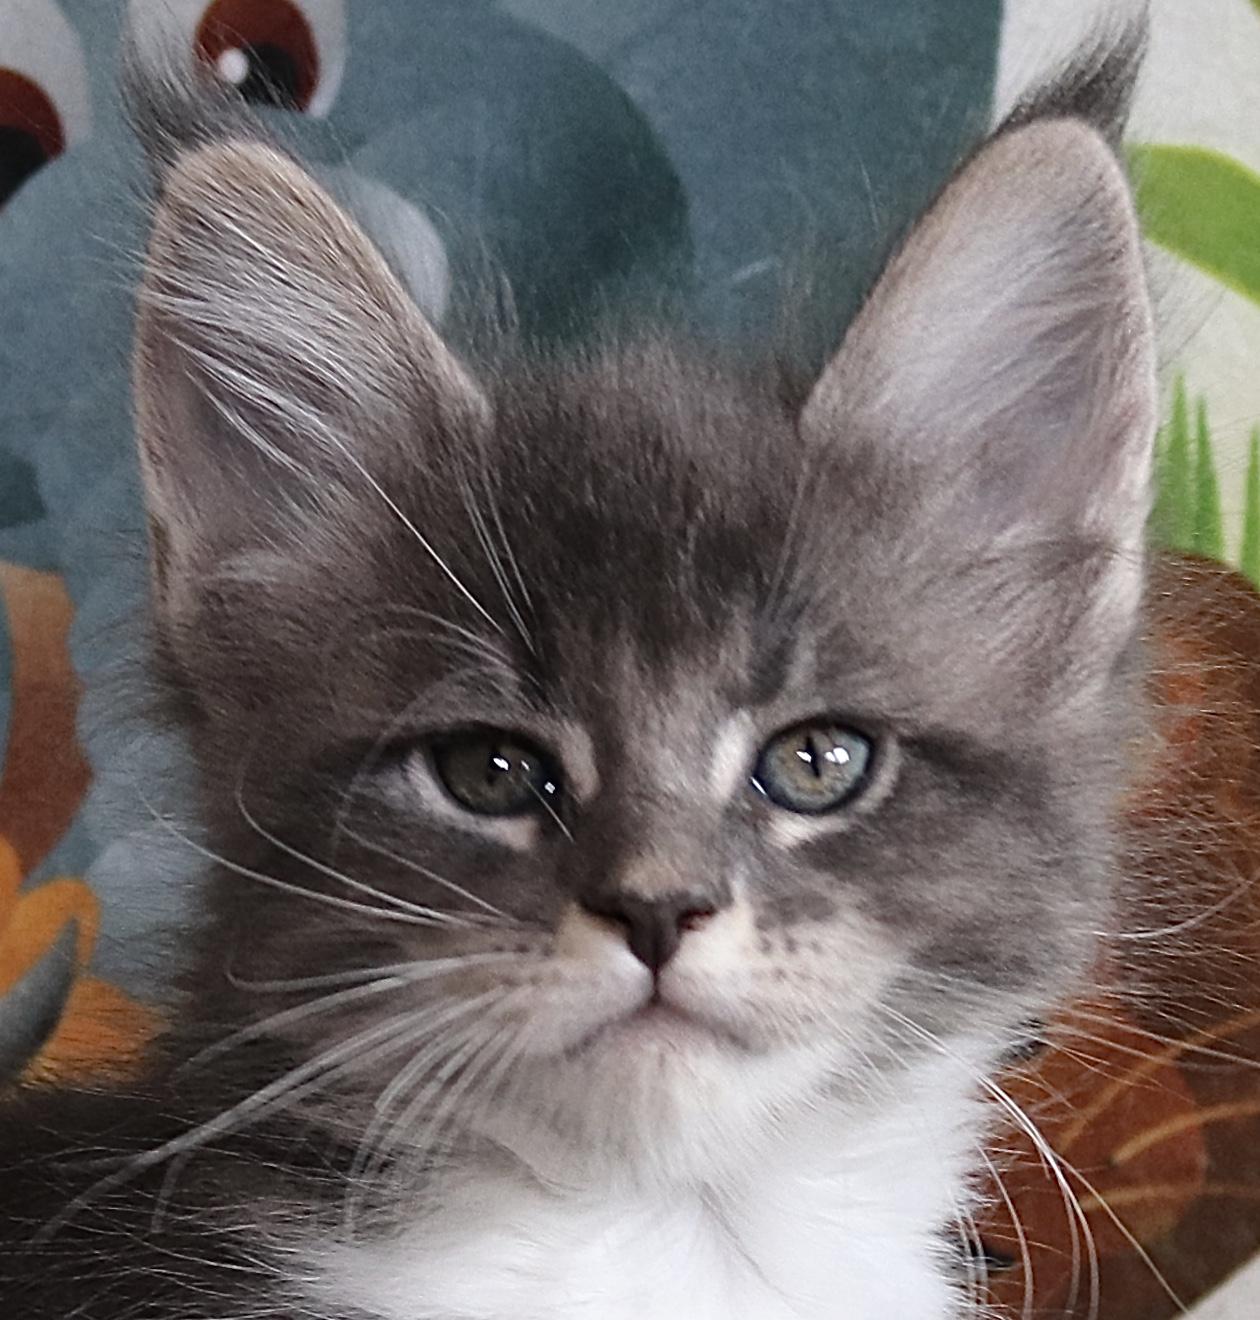 fotka kočky OGI GRAND VON ERILLIAN,CZ, female